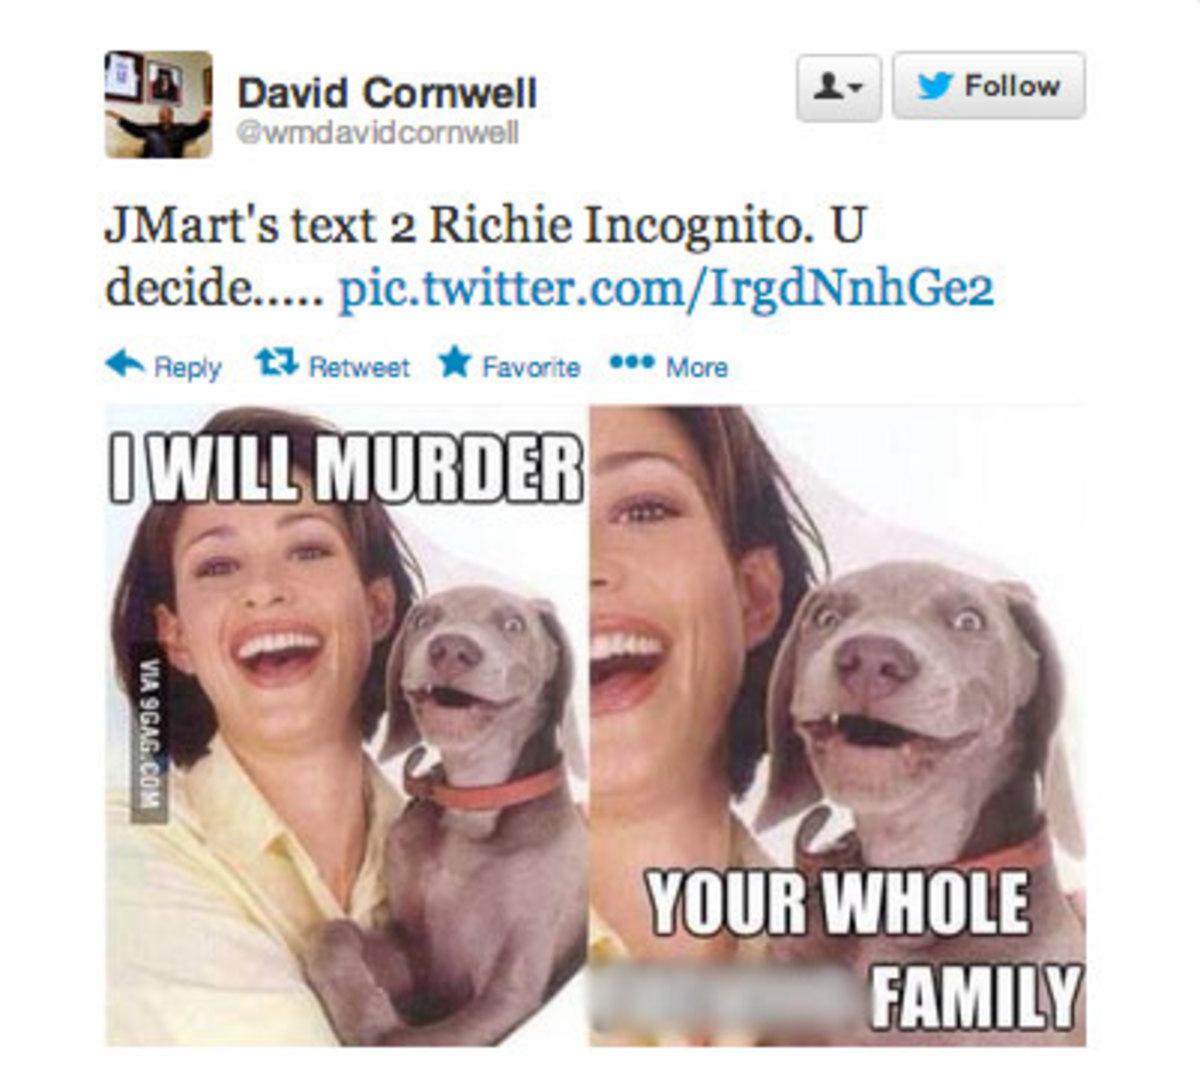 cornwell-tweet